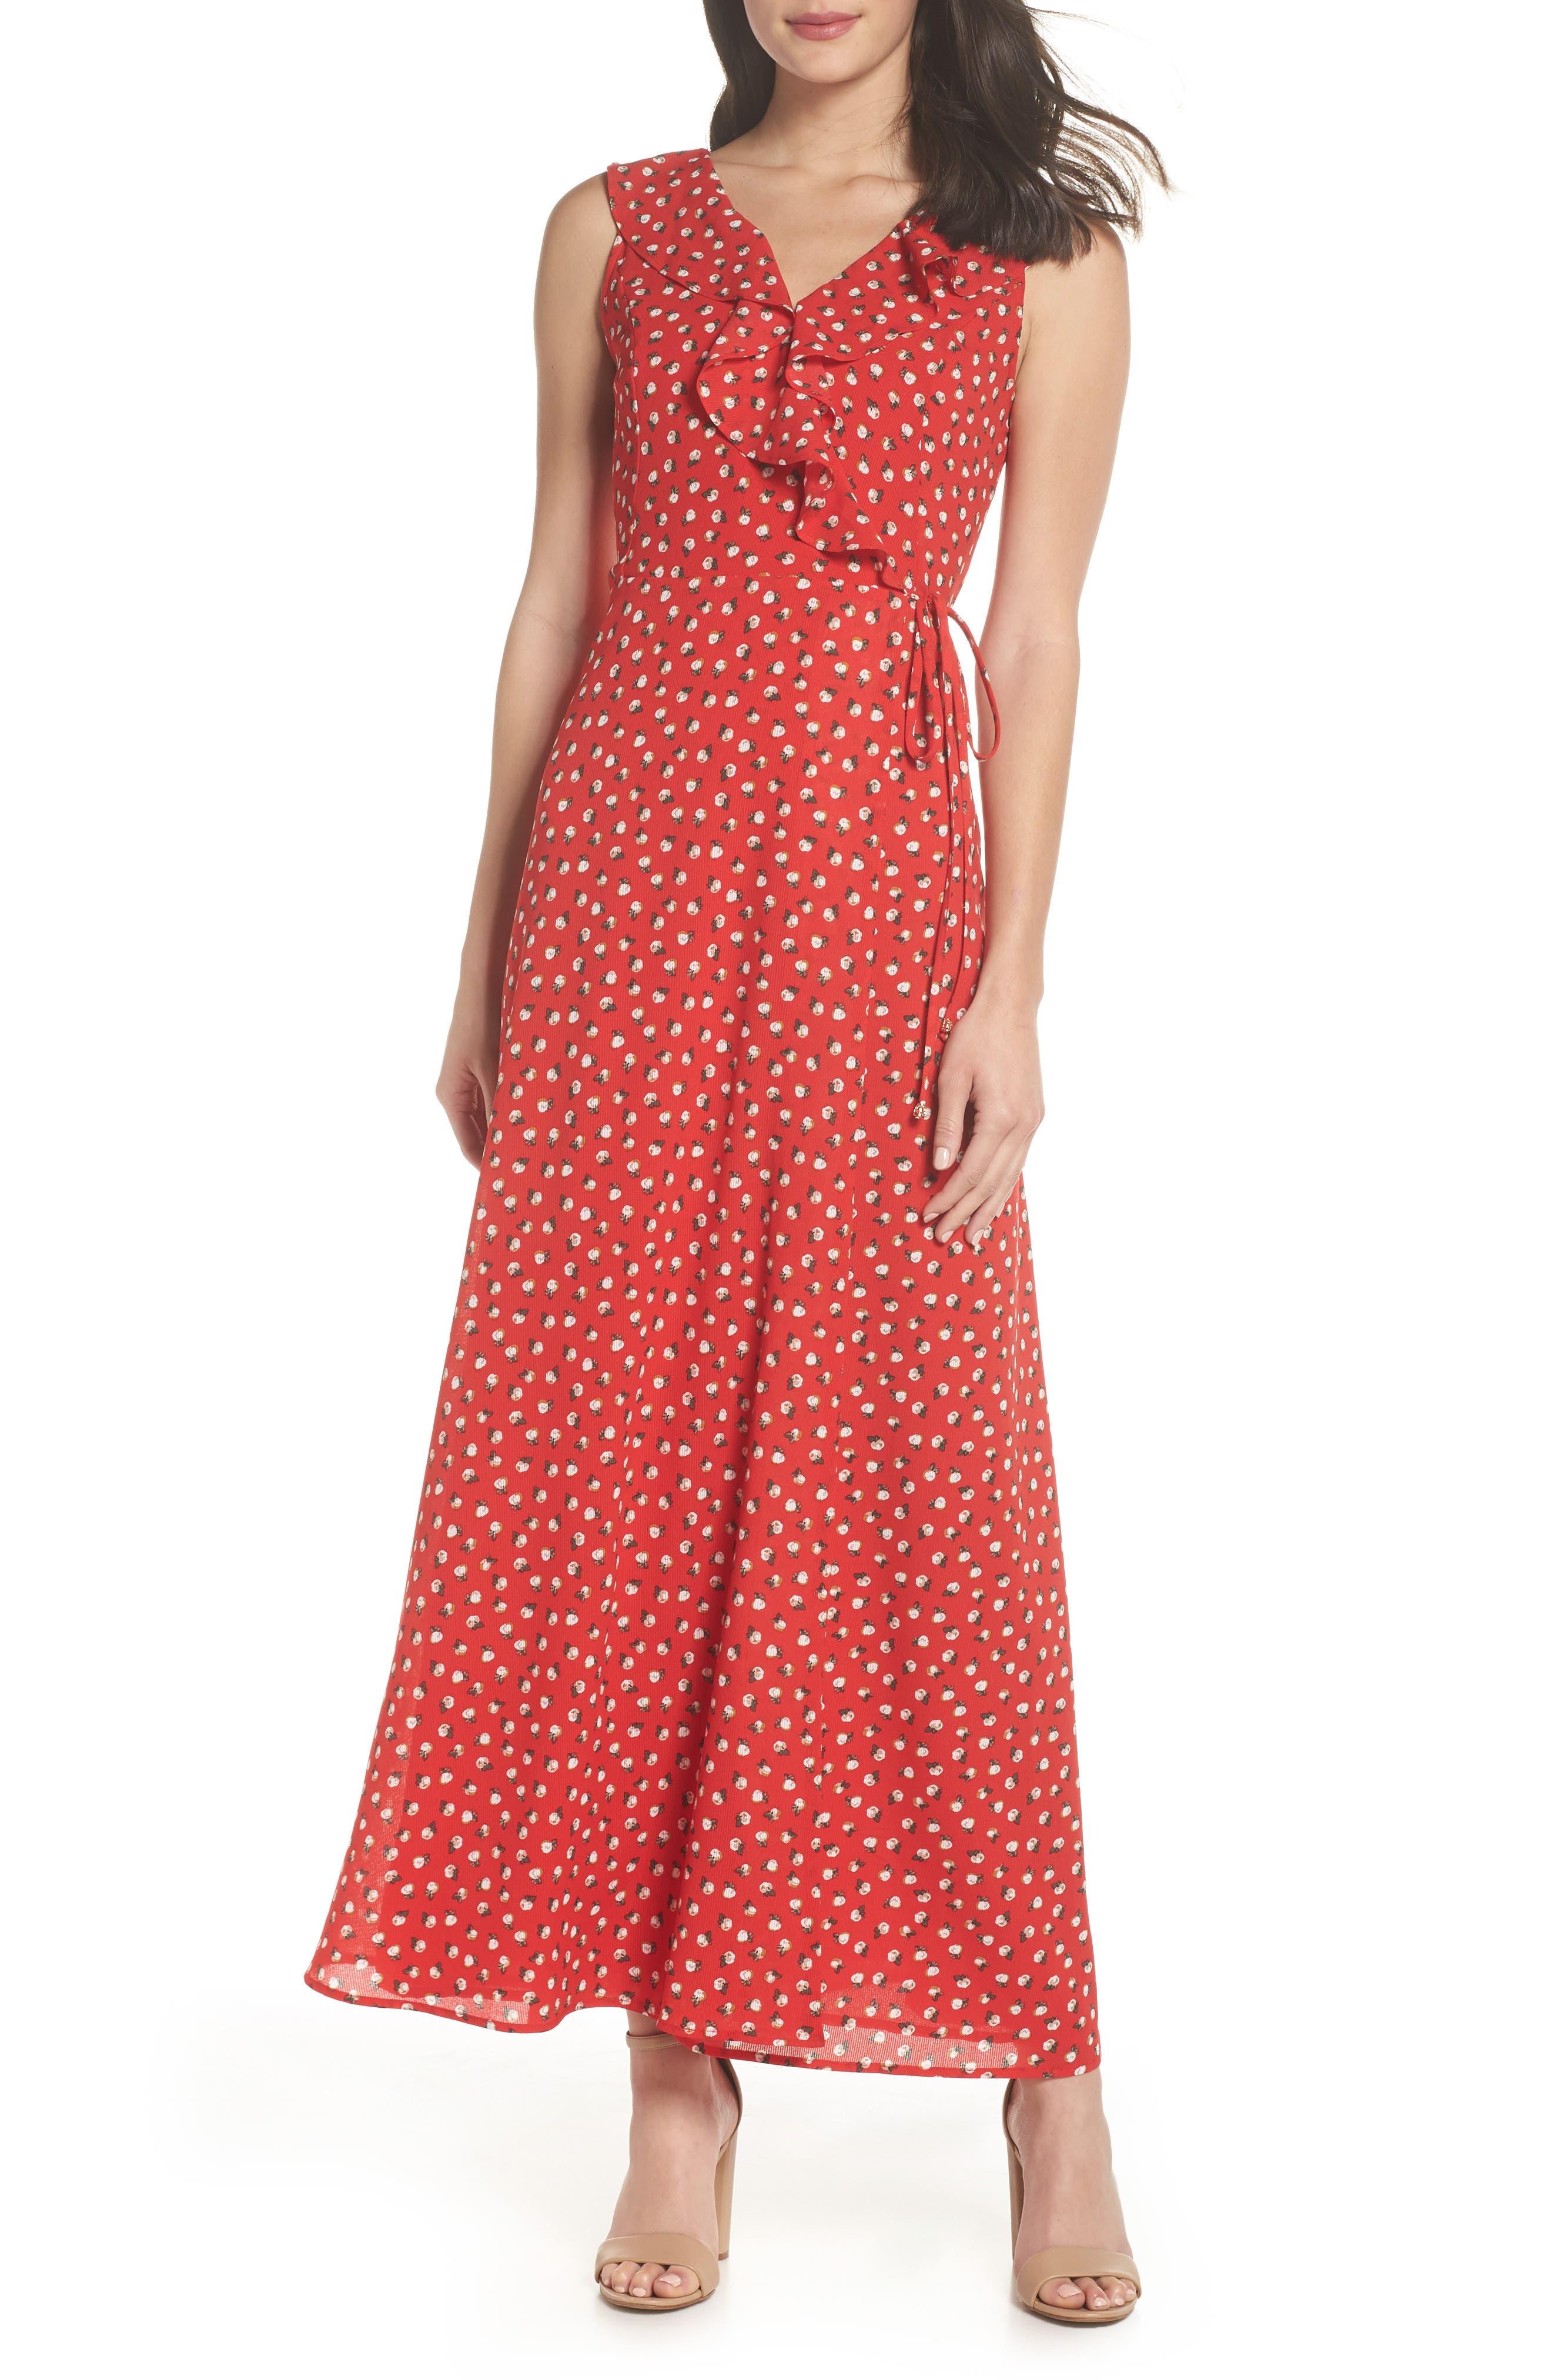 Nora Maxi Dress,                             Main thumbnail 1, color,                             Cherry